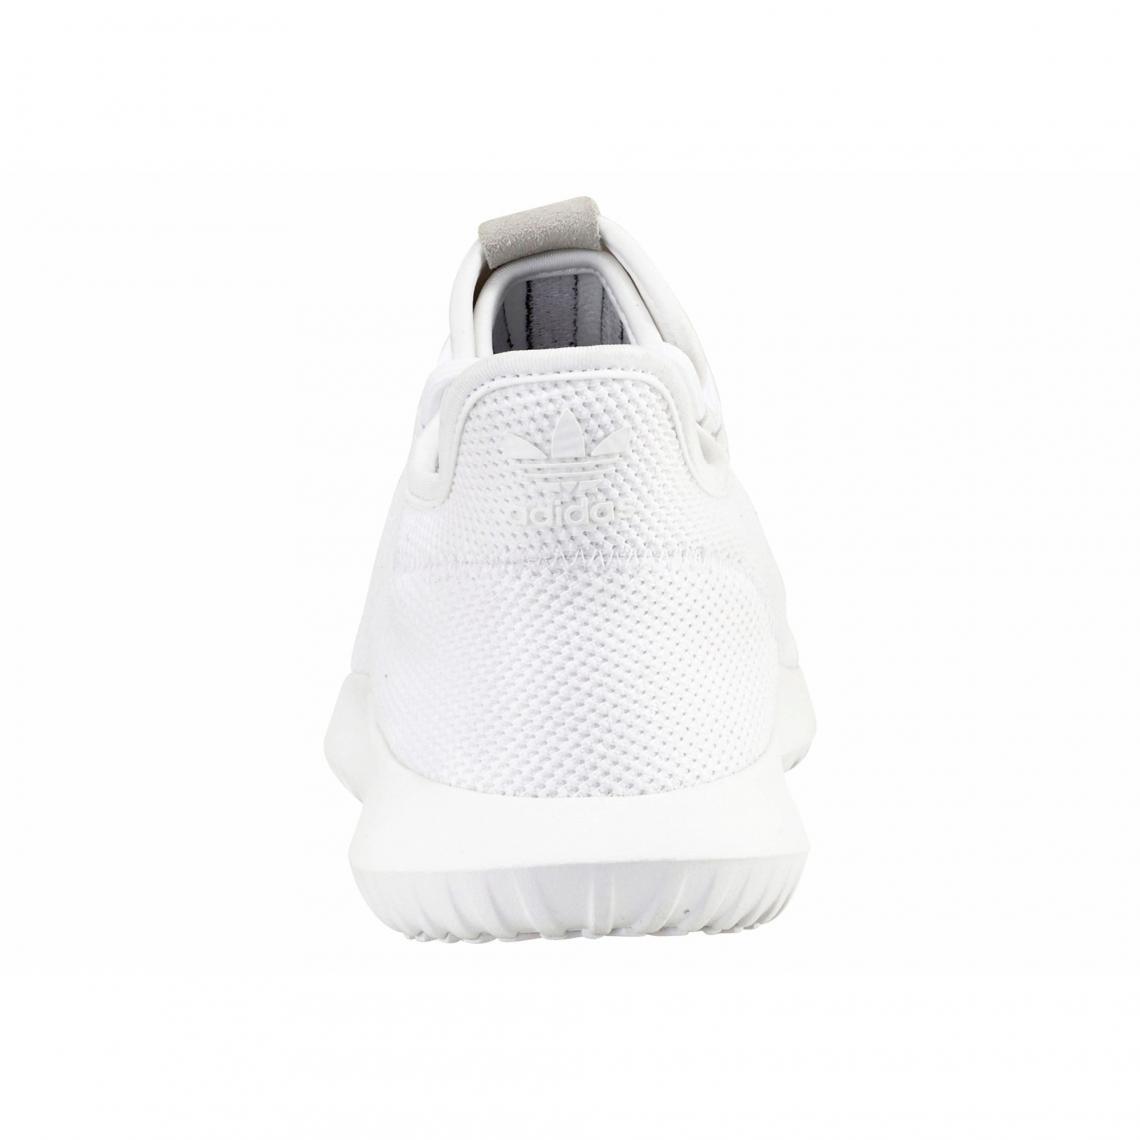 adidas Originals Tubular Shadows sneakers femme Blanc | 3